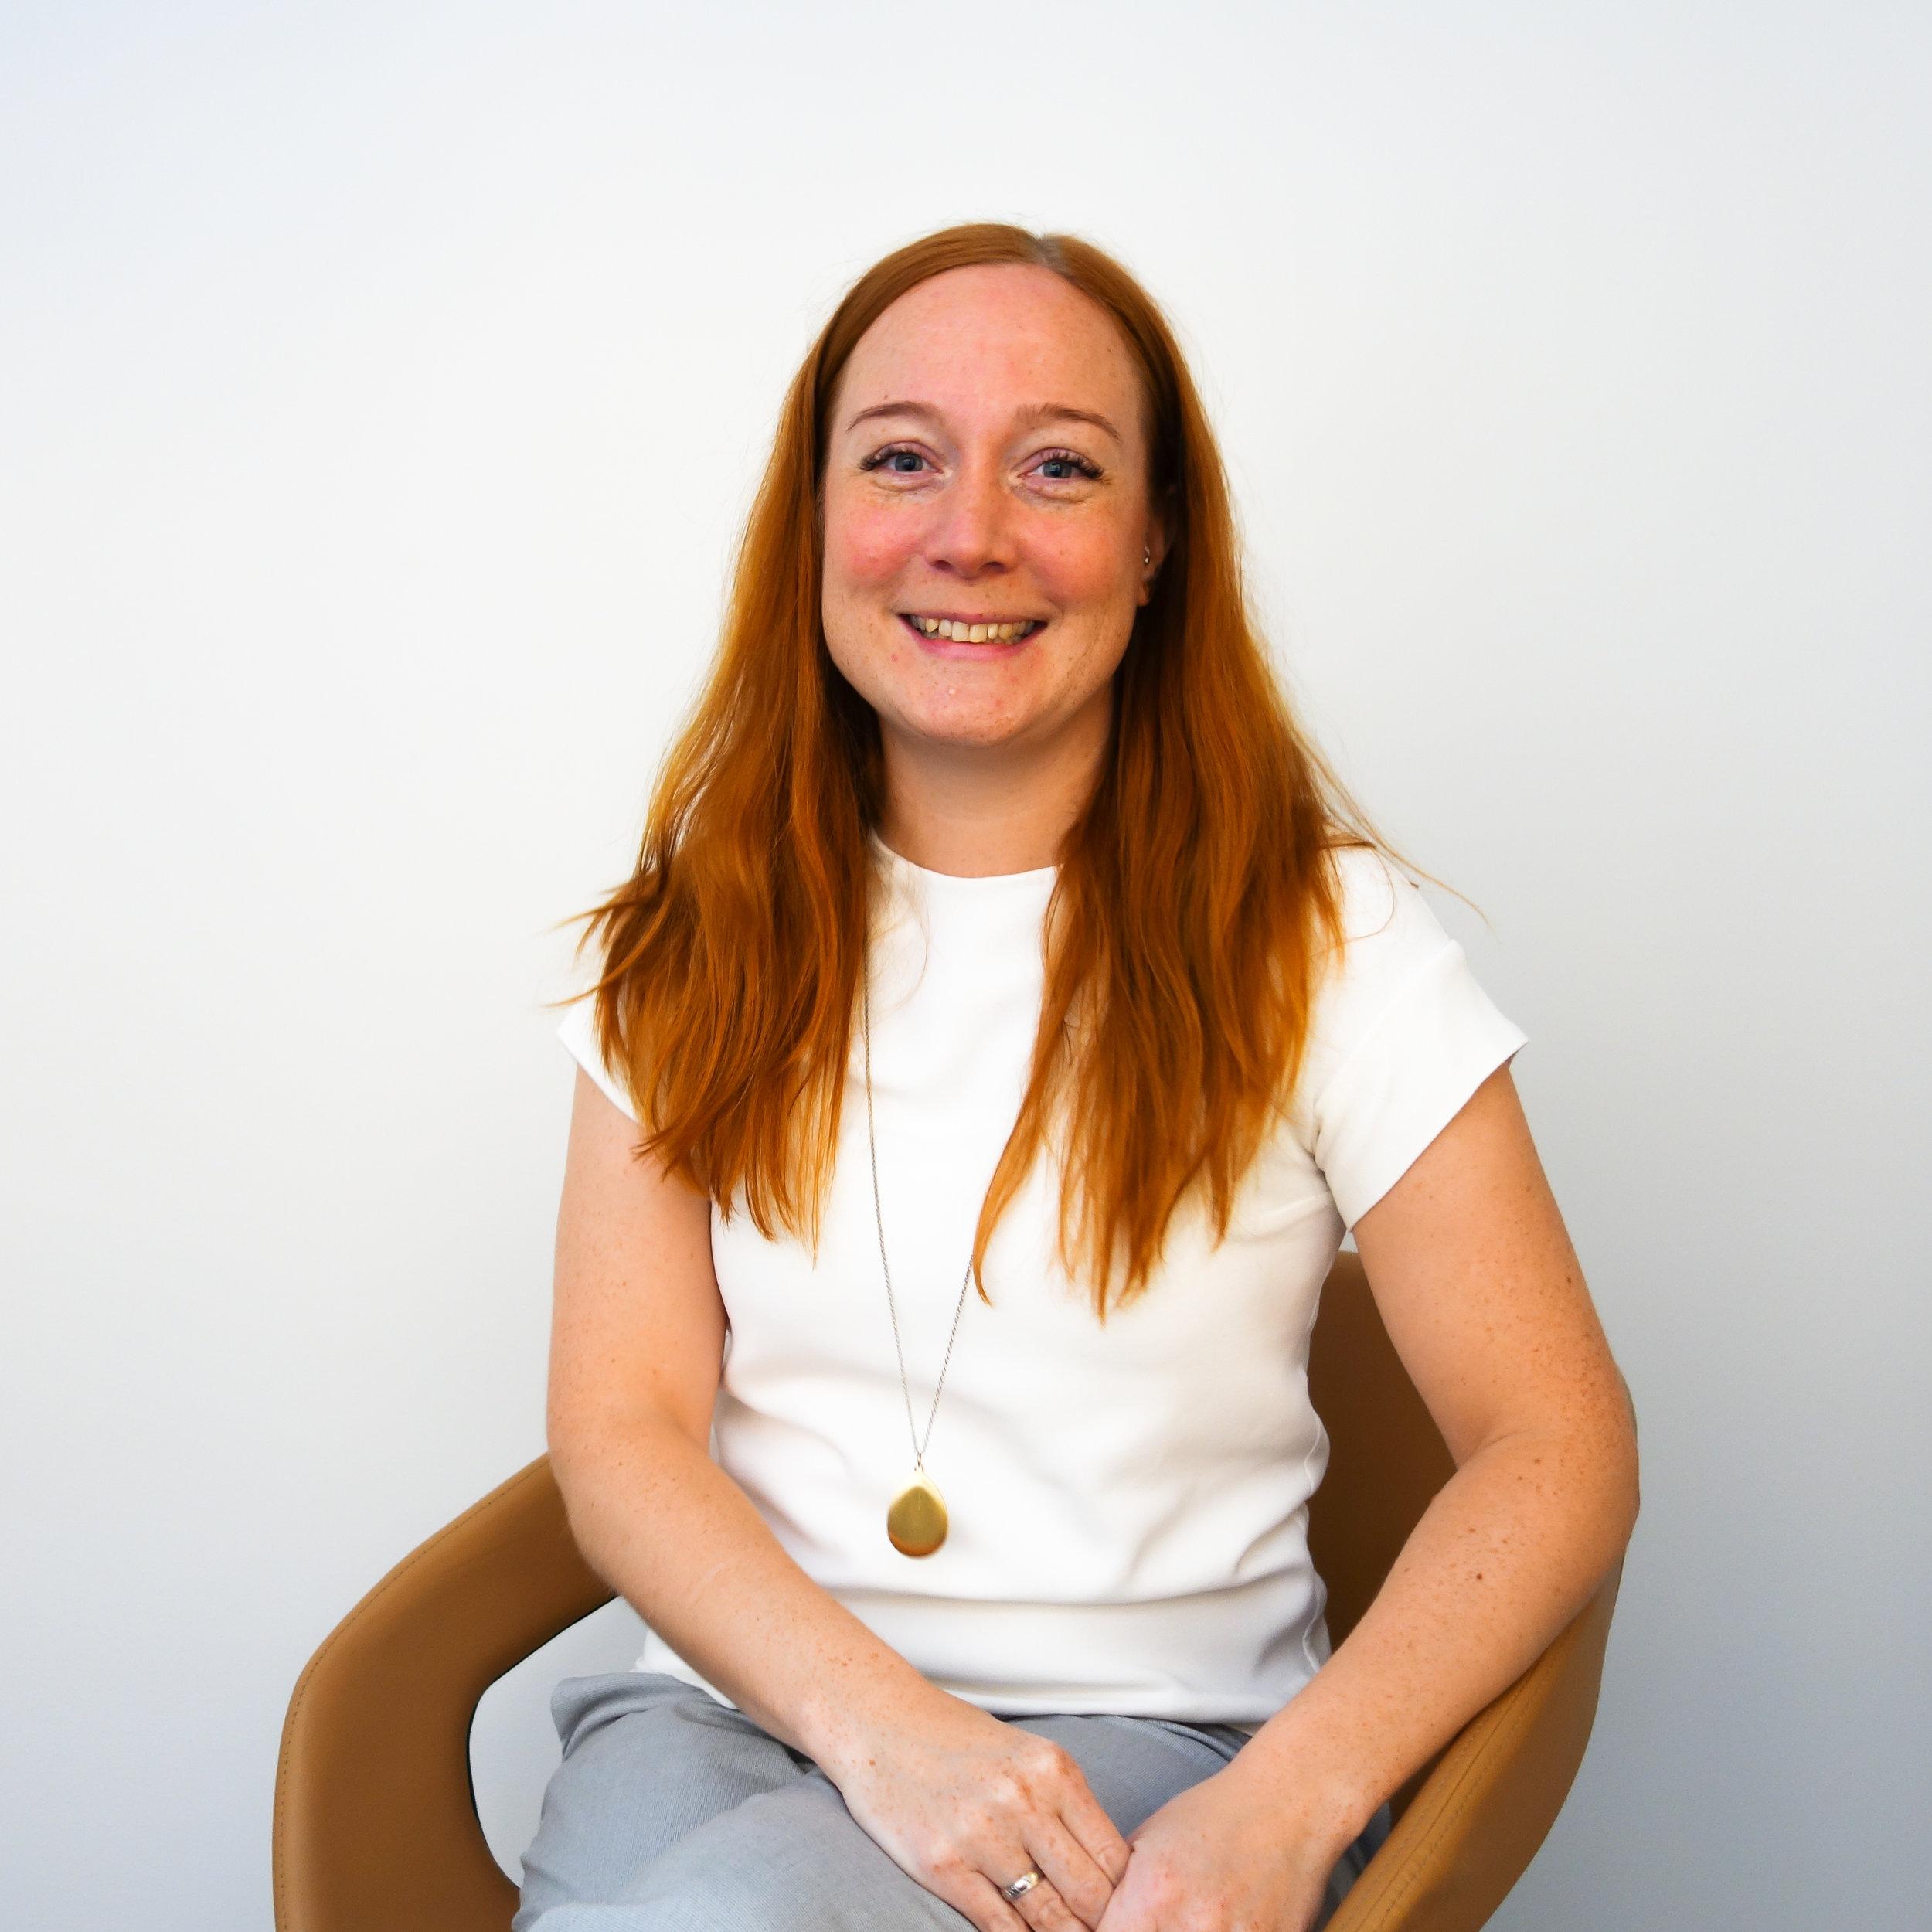 Anna-Karin Lindskog   Byggnadsingenjör  anna-karin.lindskog@elindersten.se +46(0)70-282 10 05